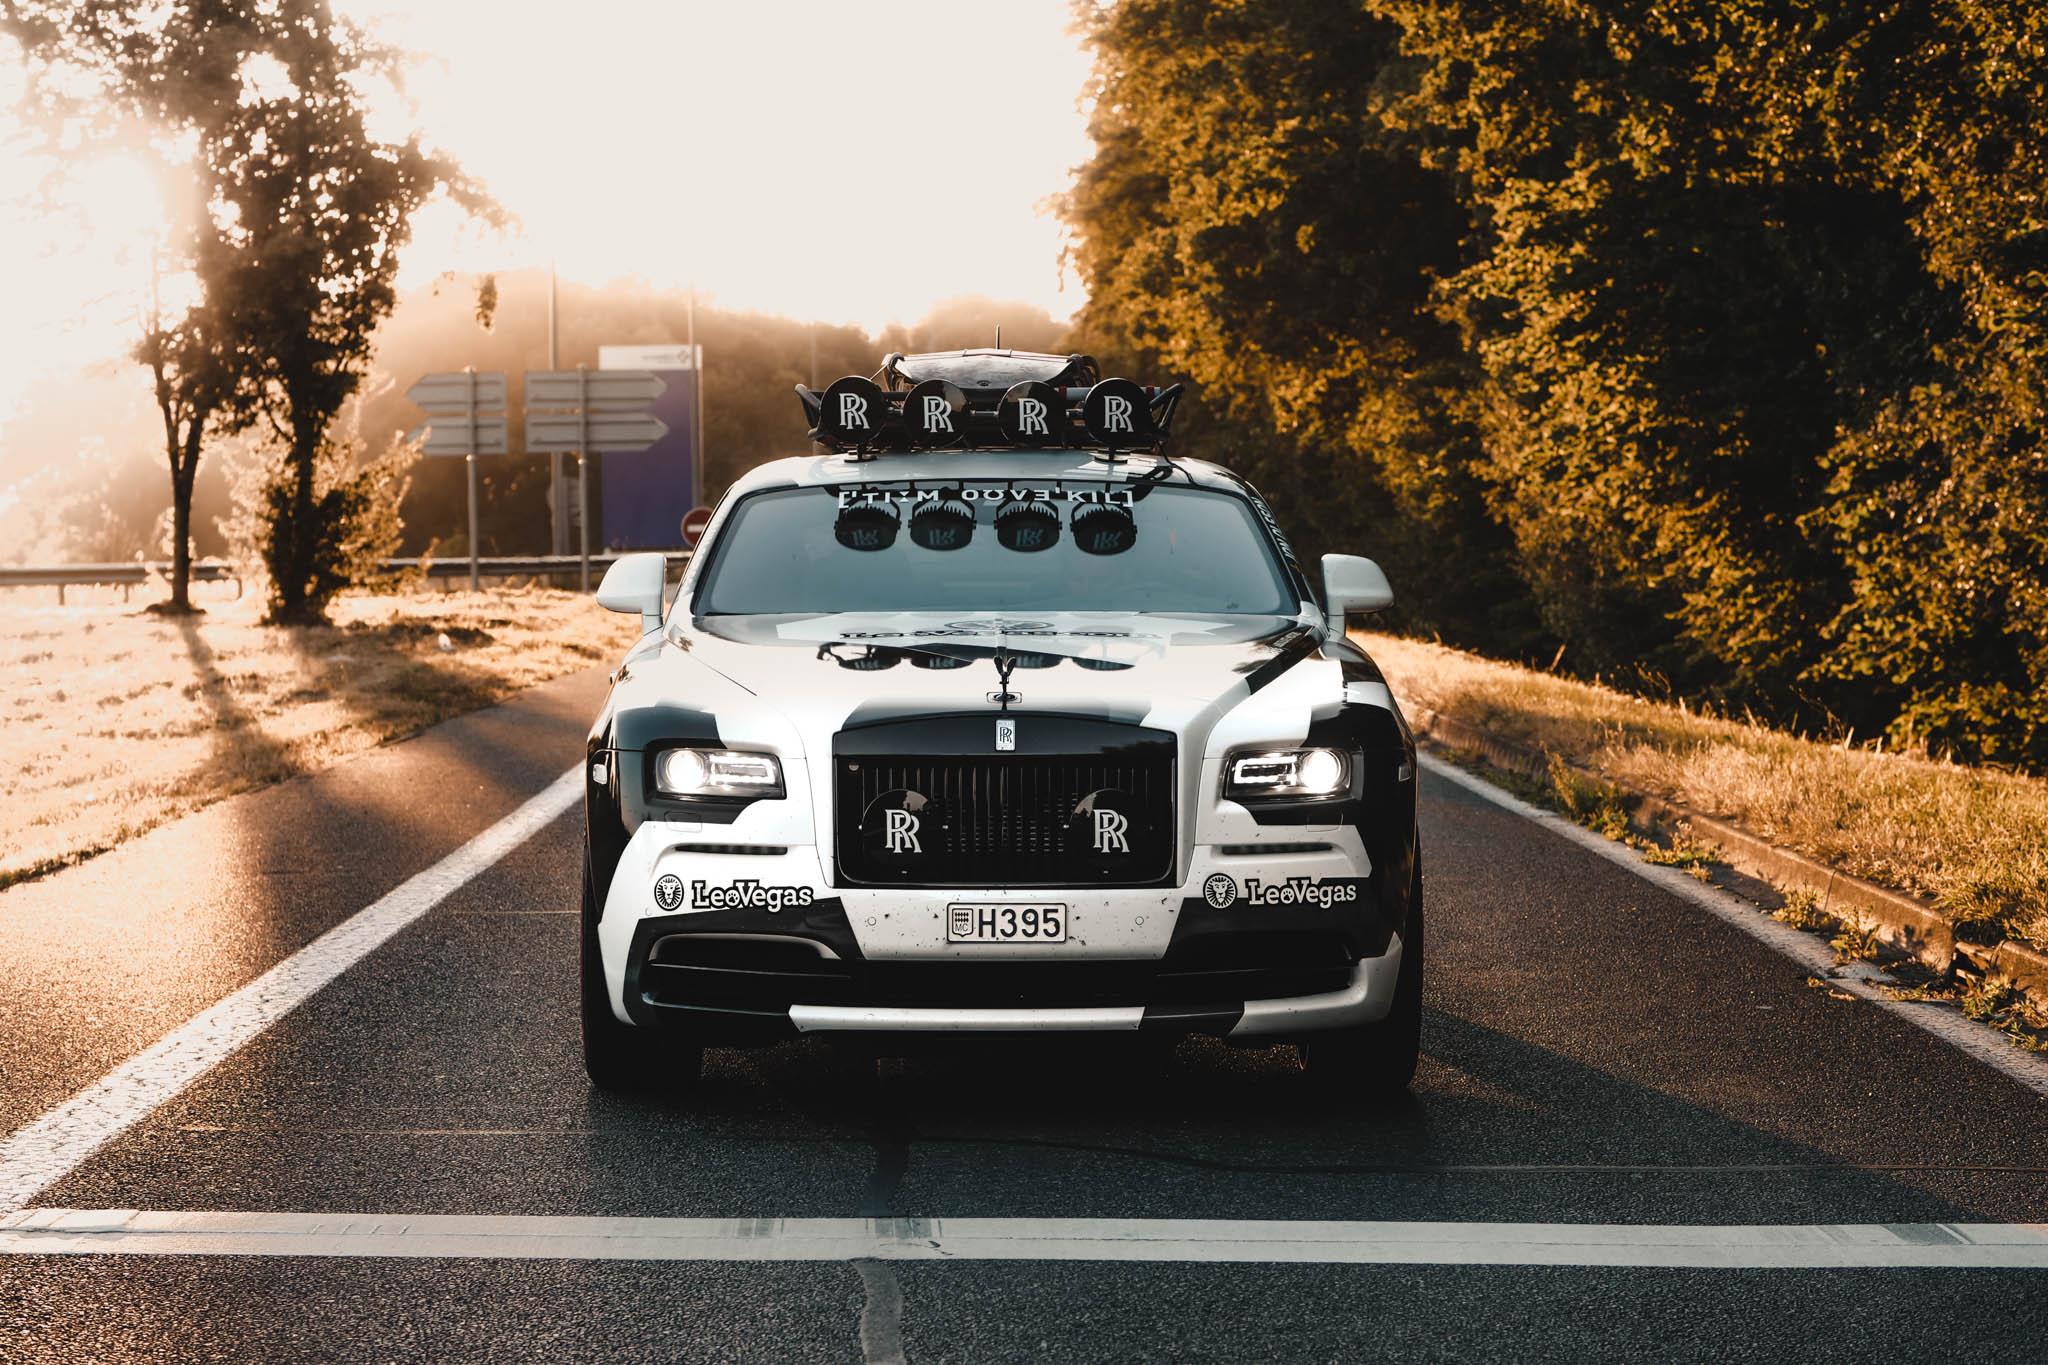 Dubai Police Car Wallpapers Video Dit Is De Rolls Royce Wraith Van Jon Olsson